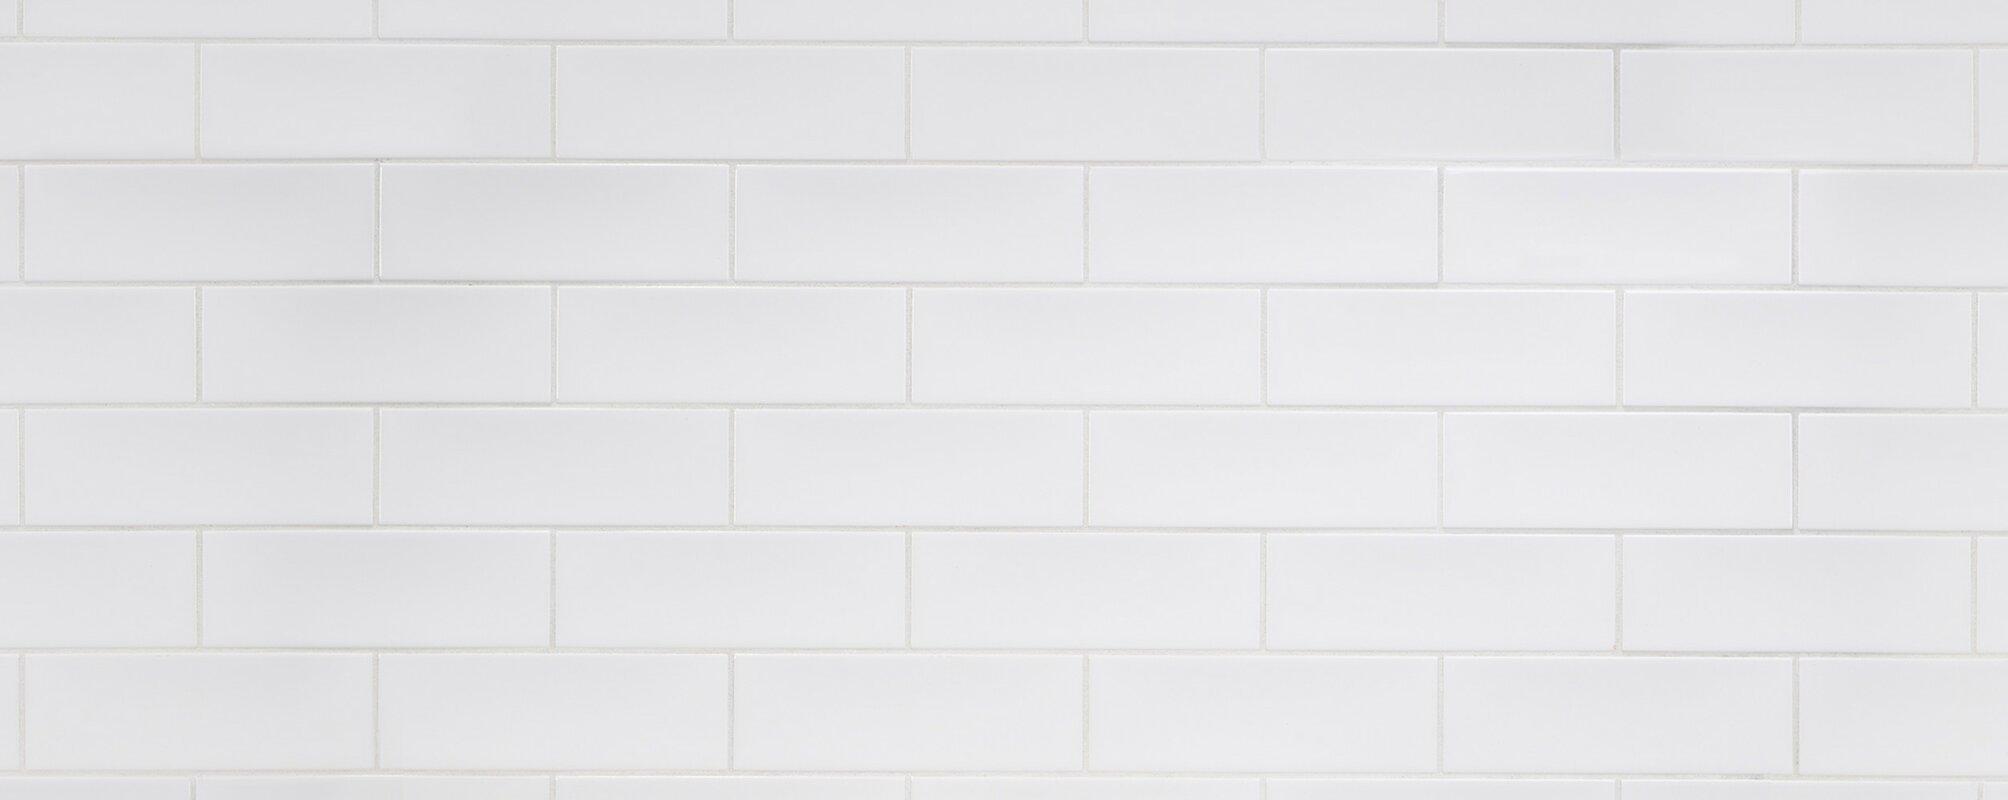 4 x 8 ceramic tile techieblogiefo 4 x 8 ceramic tile image collections flooring design ideas dailygadgetfo Image collections